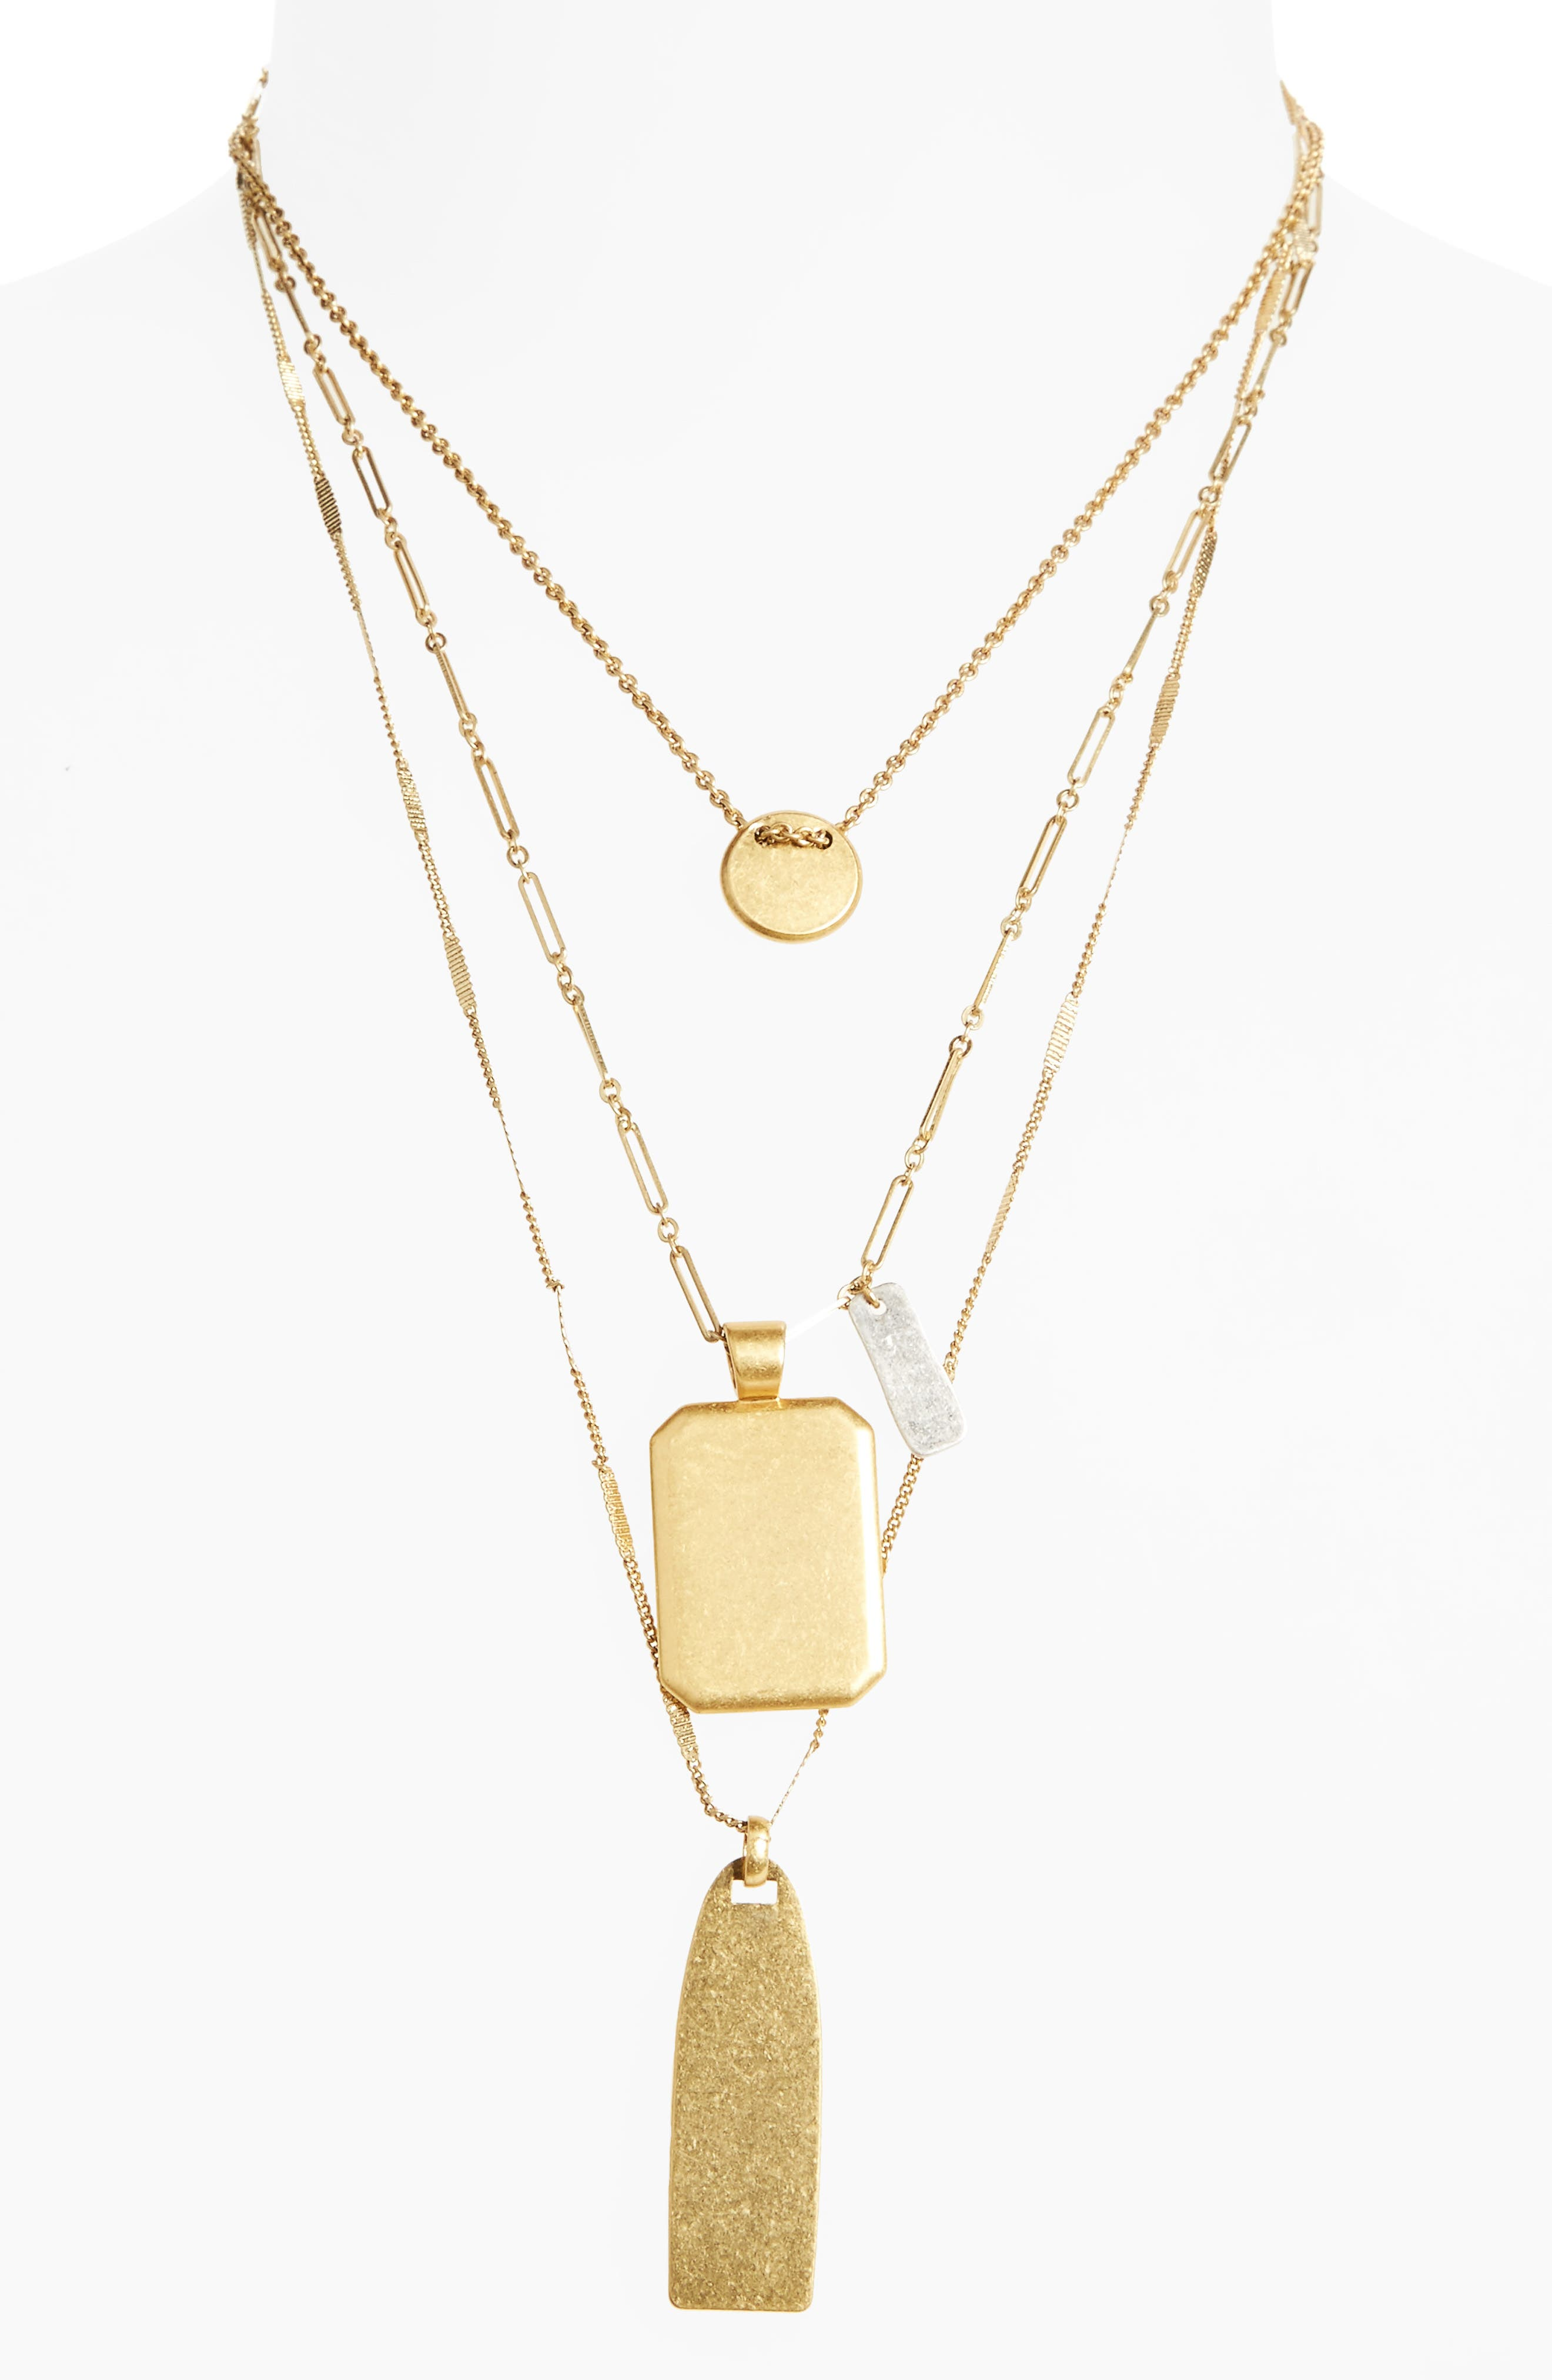 Main Image - Madewell Treasure Pendant Necklace Set